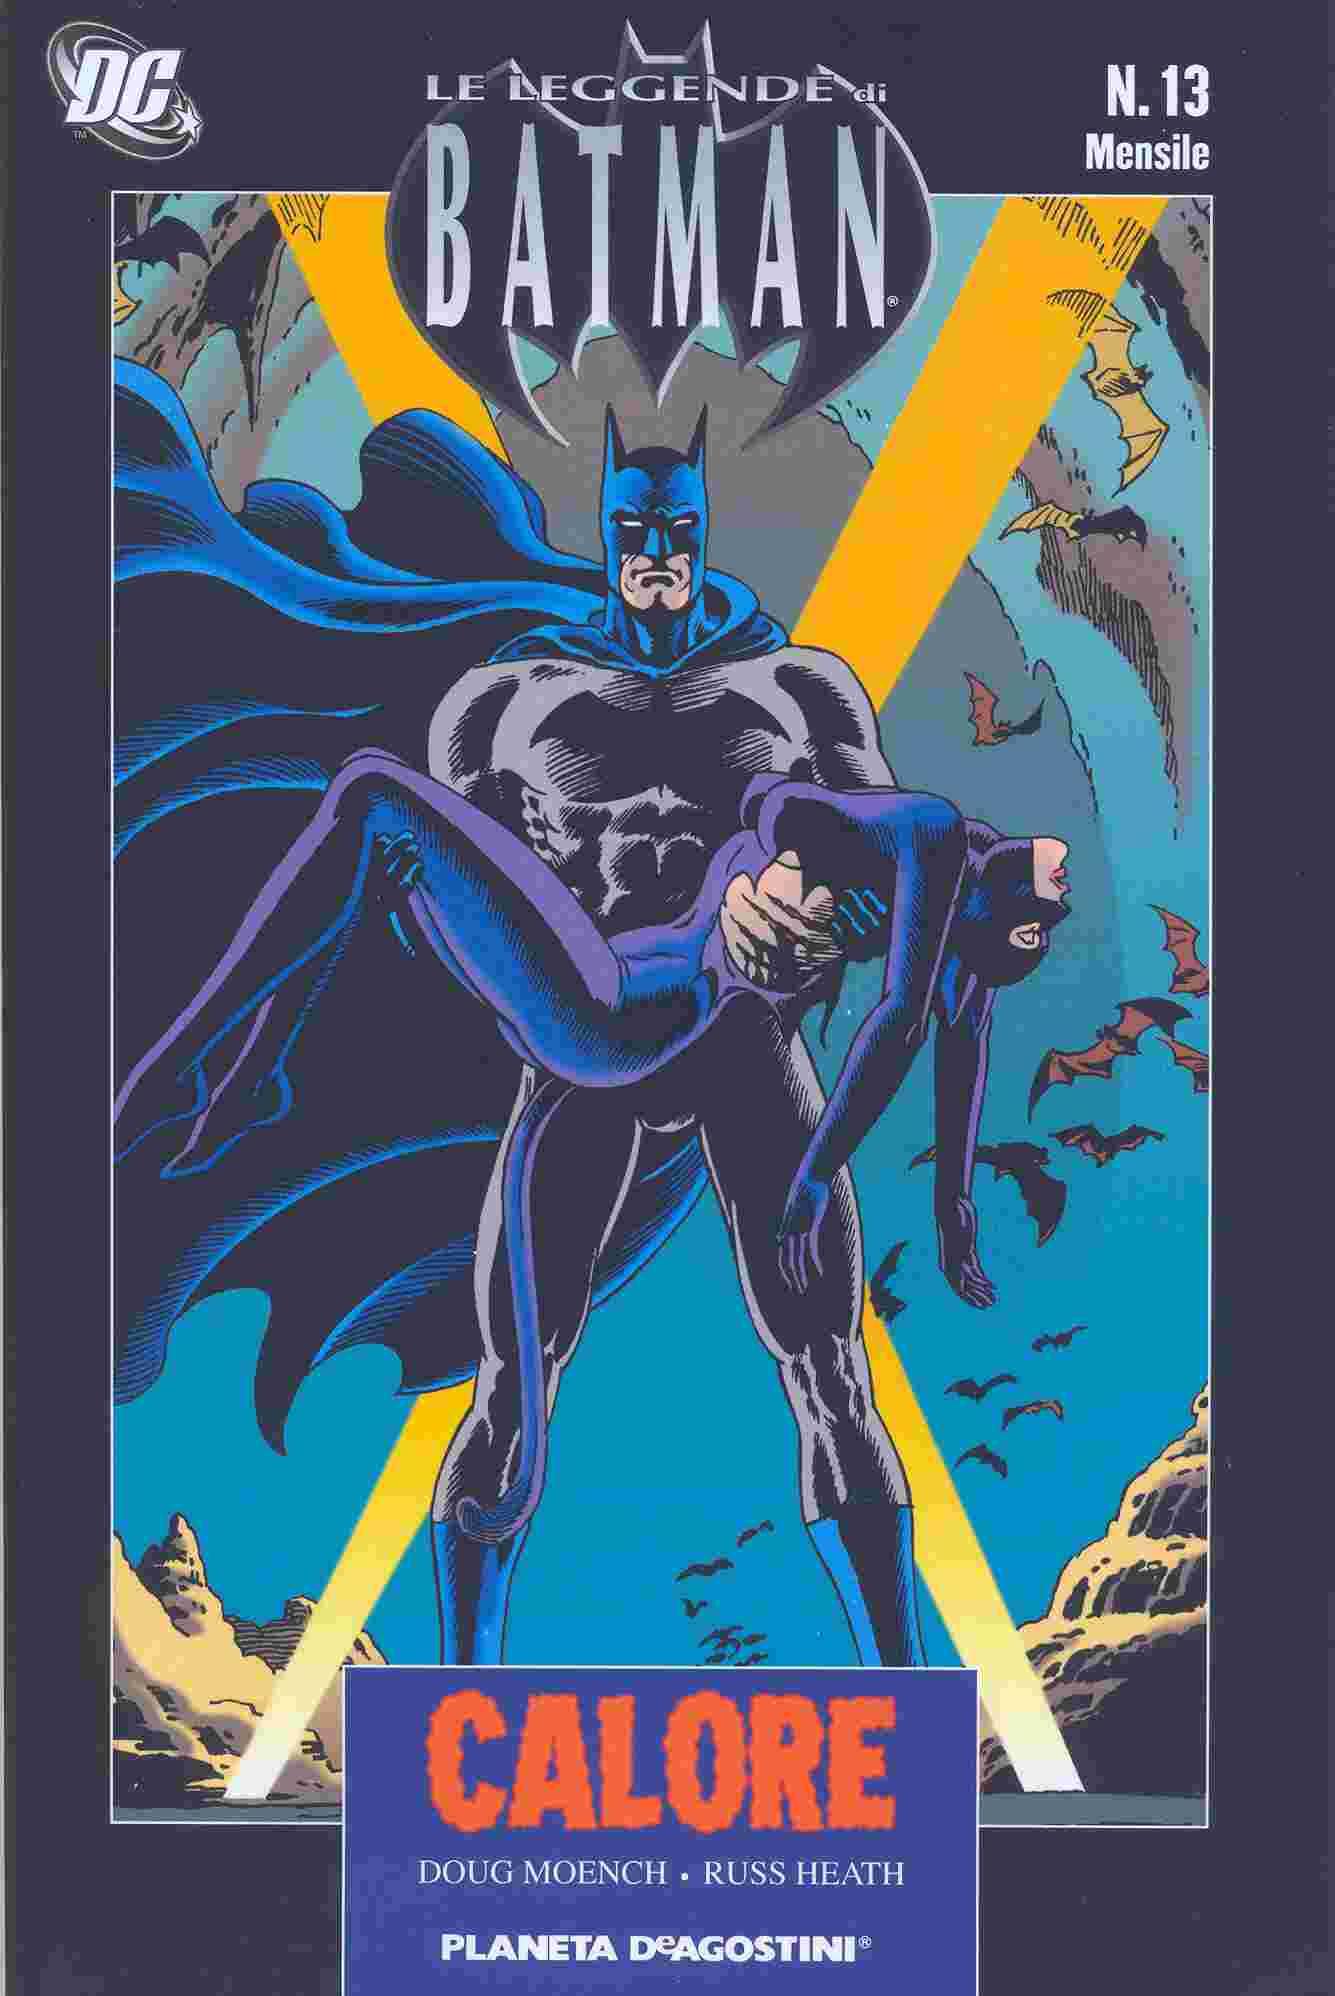 Le leggende di Batman n. 13